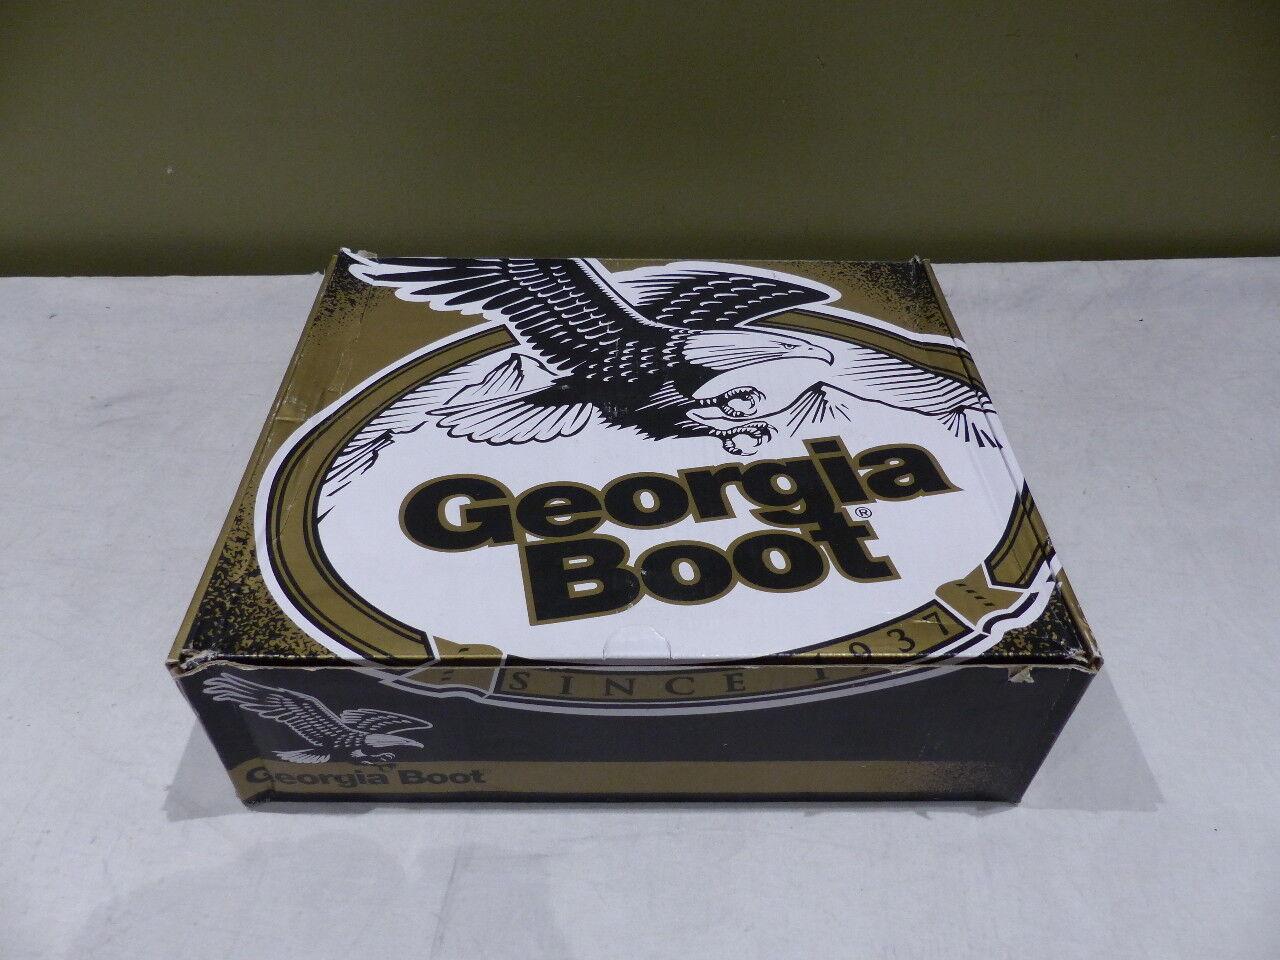 GEORGIA MENS MENS MENS 8IN nero LOGGERS WATERPROOF stivali SZ 11W G8010 c86995